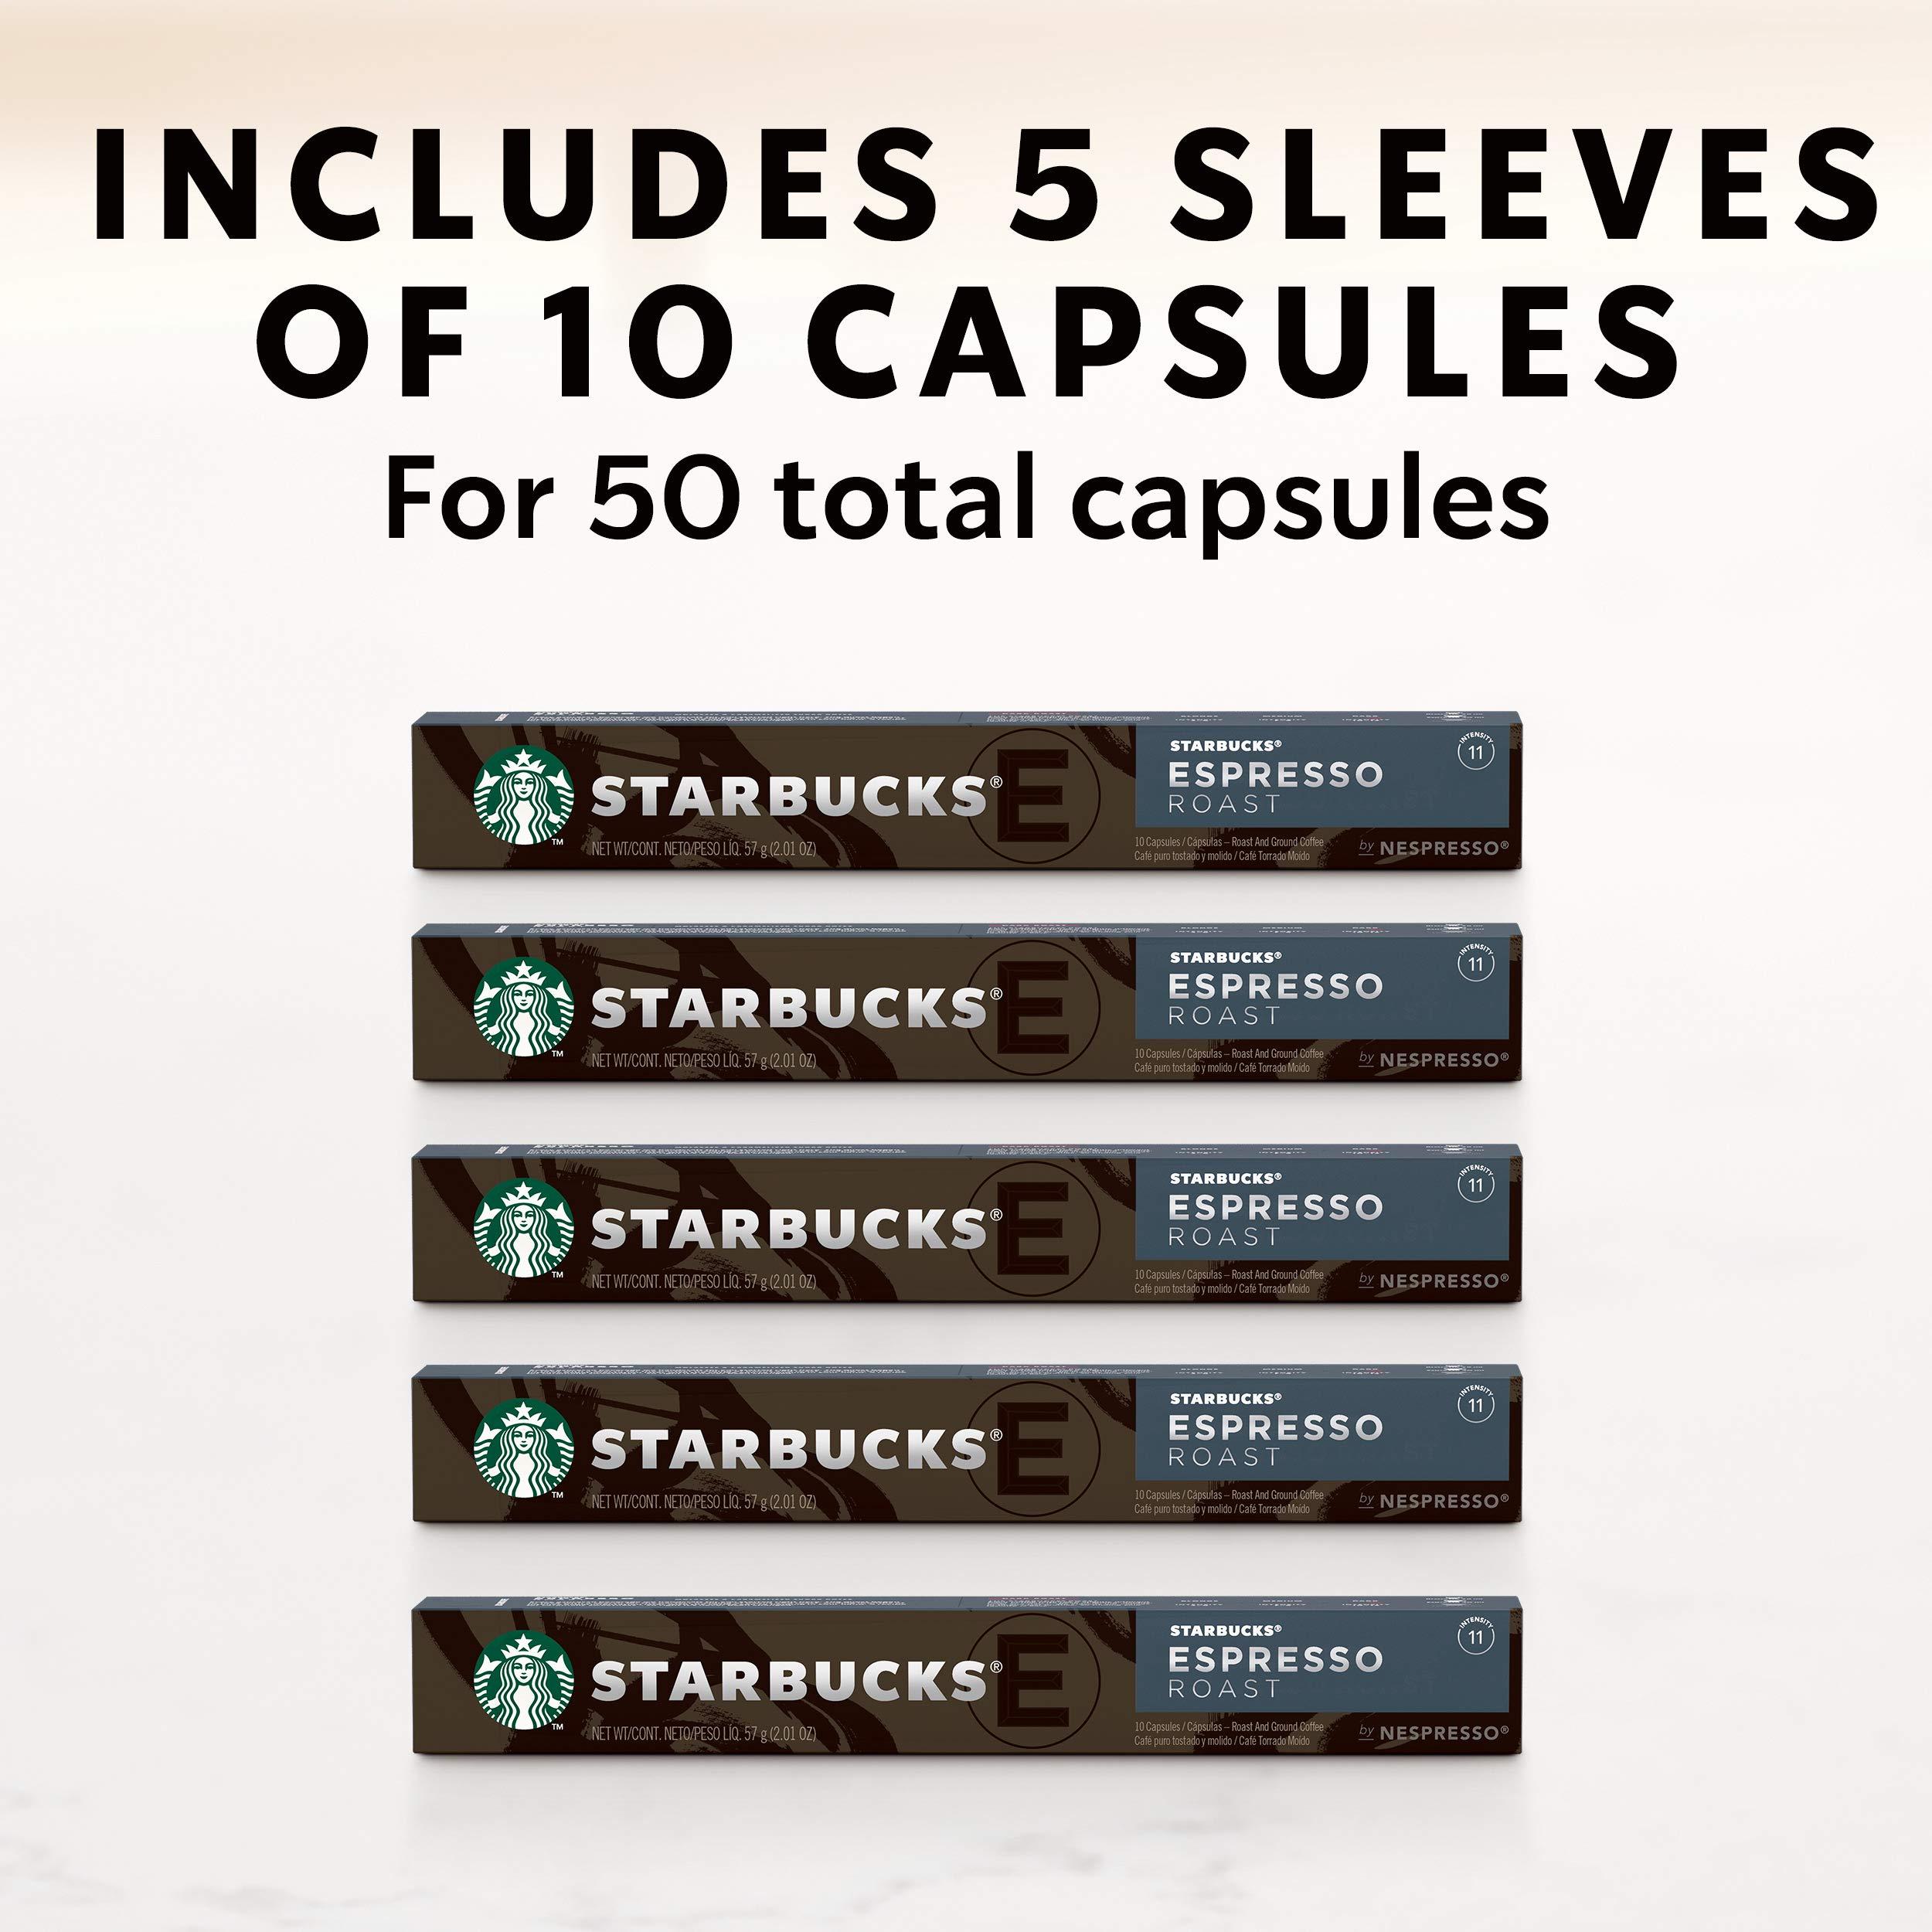 Starbucks by Nespresso, Espresso Dark Roast (50-count single serve capsules, compatible with Nespresso Original Line System) by Starbucks for Nespresso (Image #7)